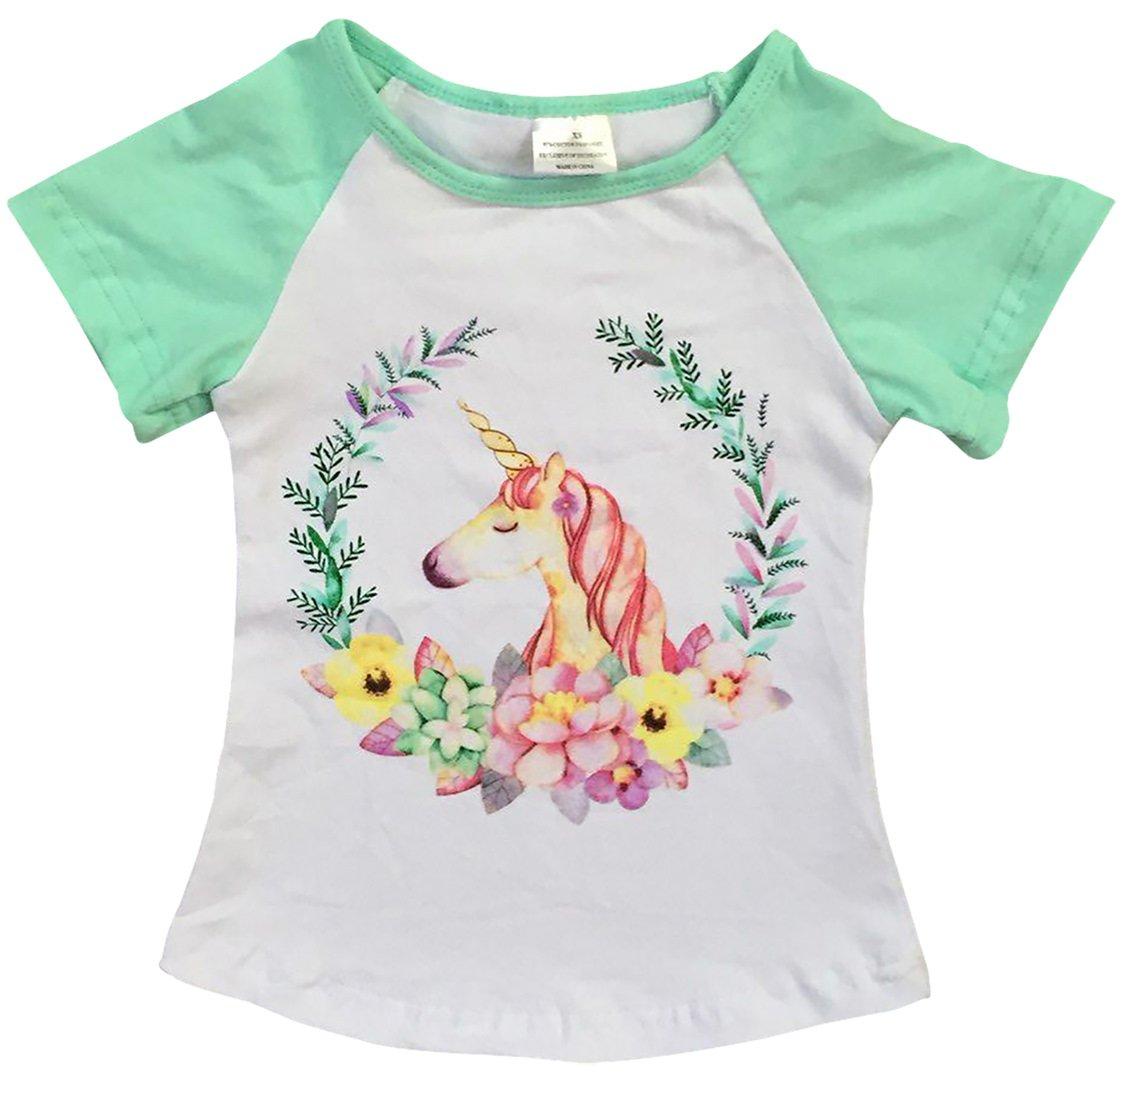 Little Girls' Short Sleeve Unicorn Floral Summer Raglan Top T Shirt Tee Clothing Mint 5 L (P201455P)